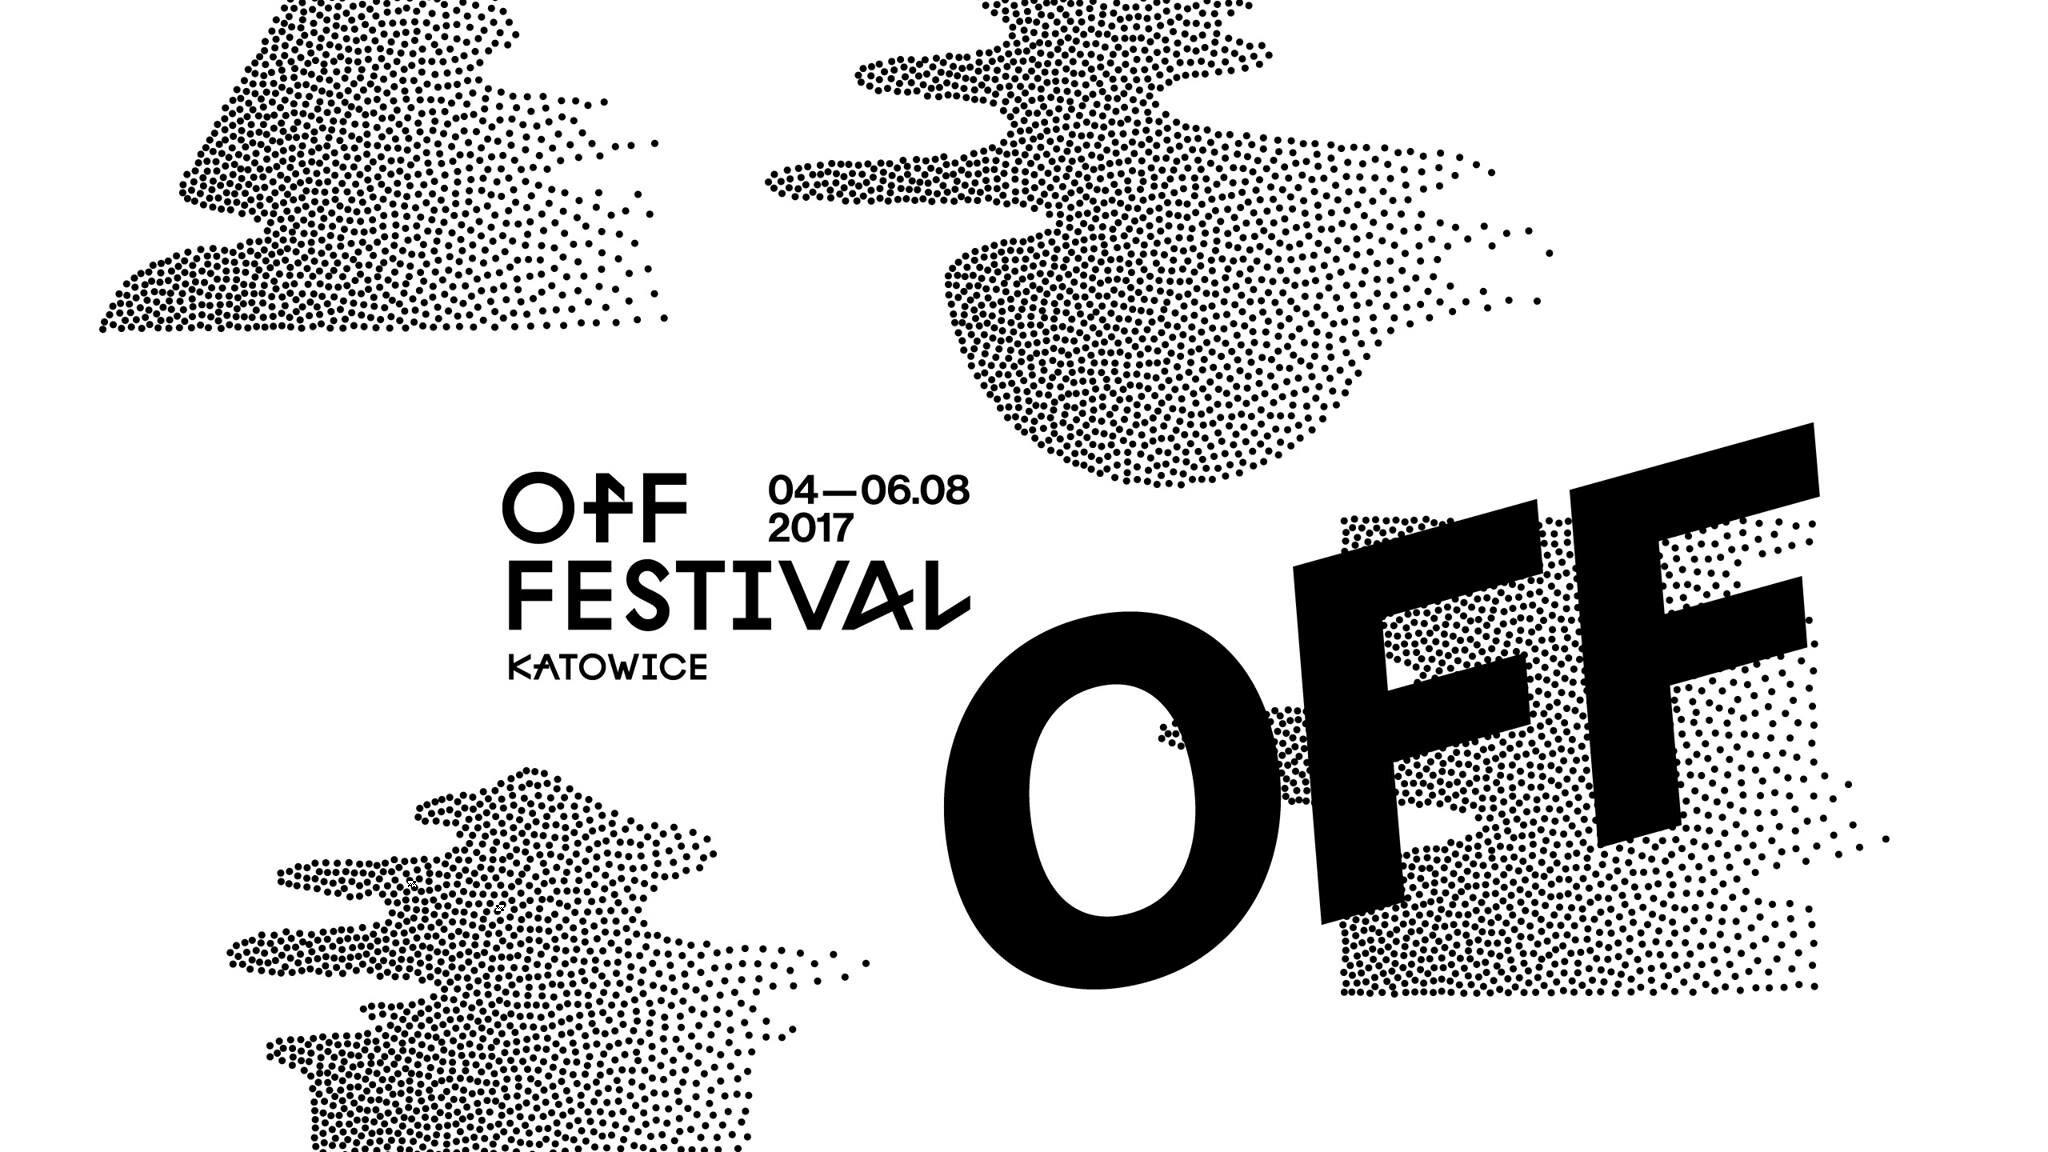 OFF Festival Katowice 04-06.08. 2017